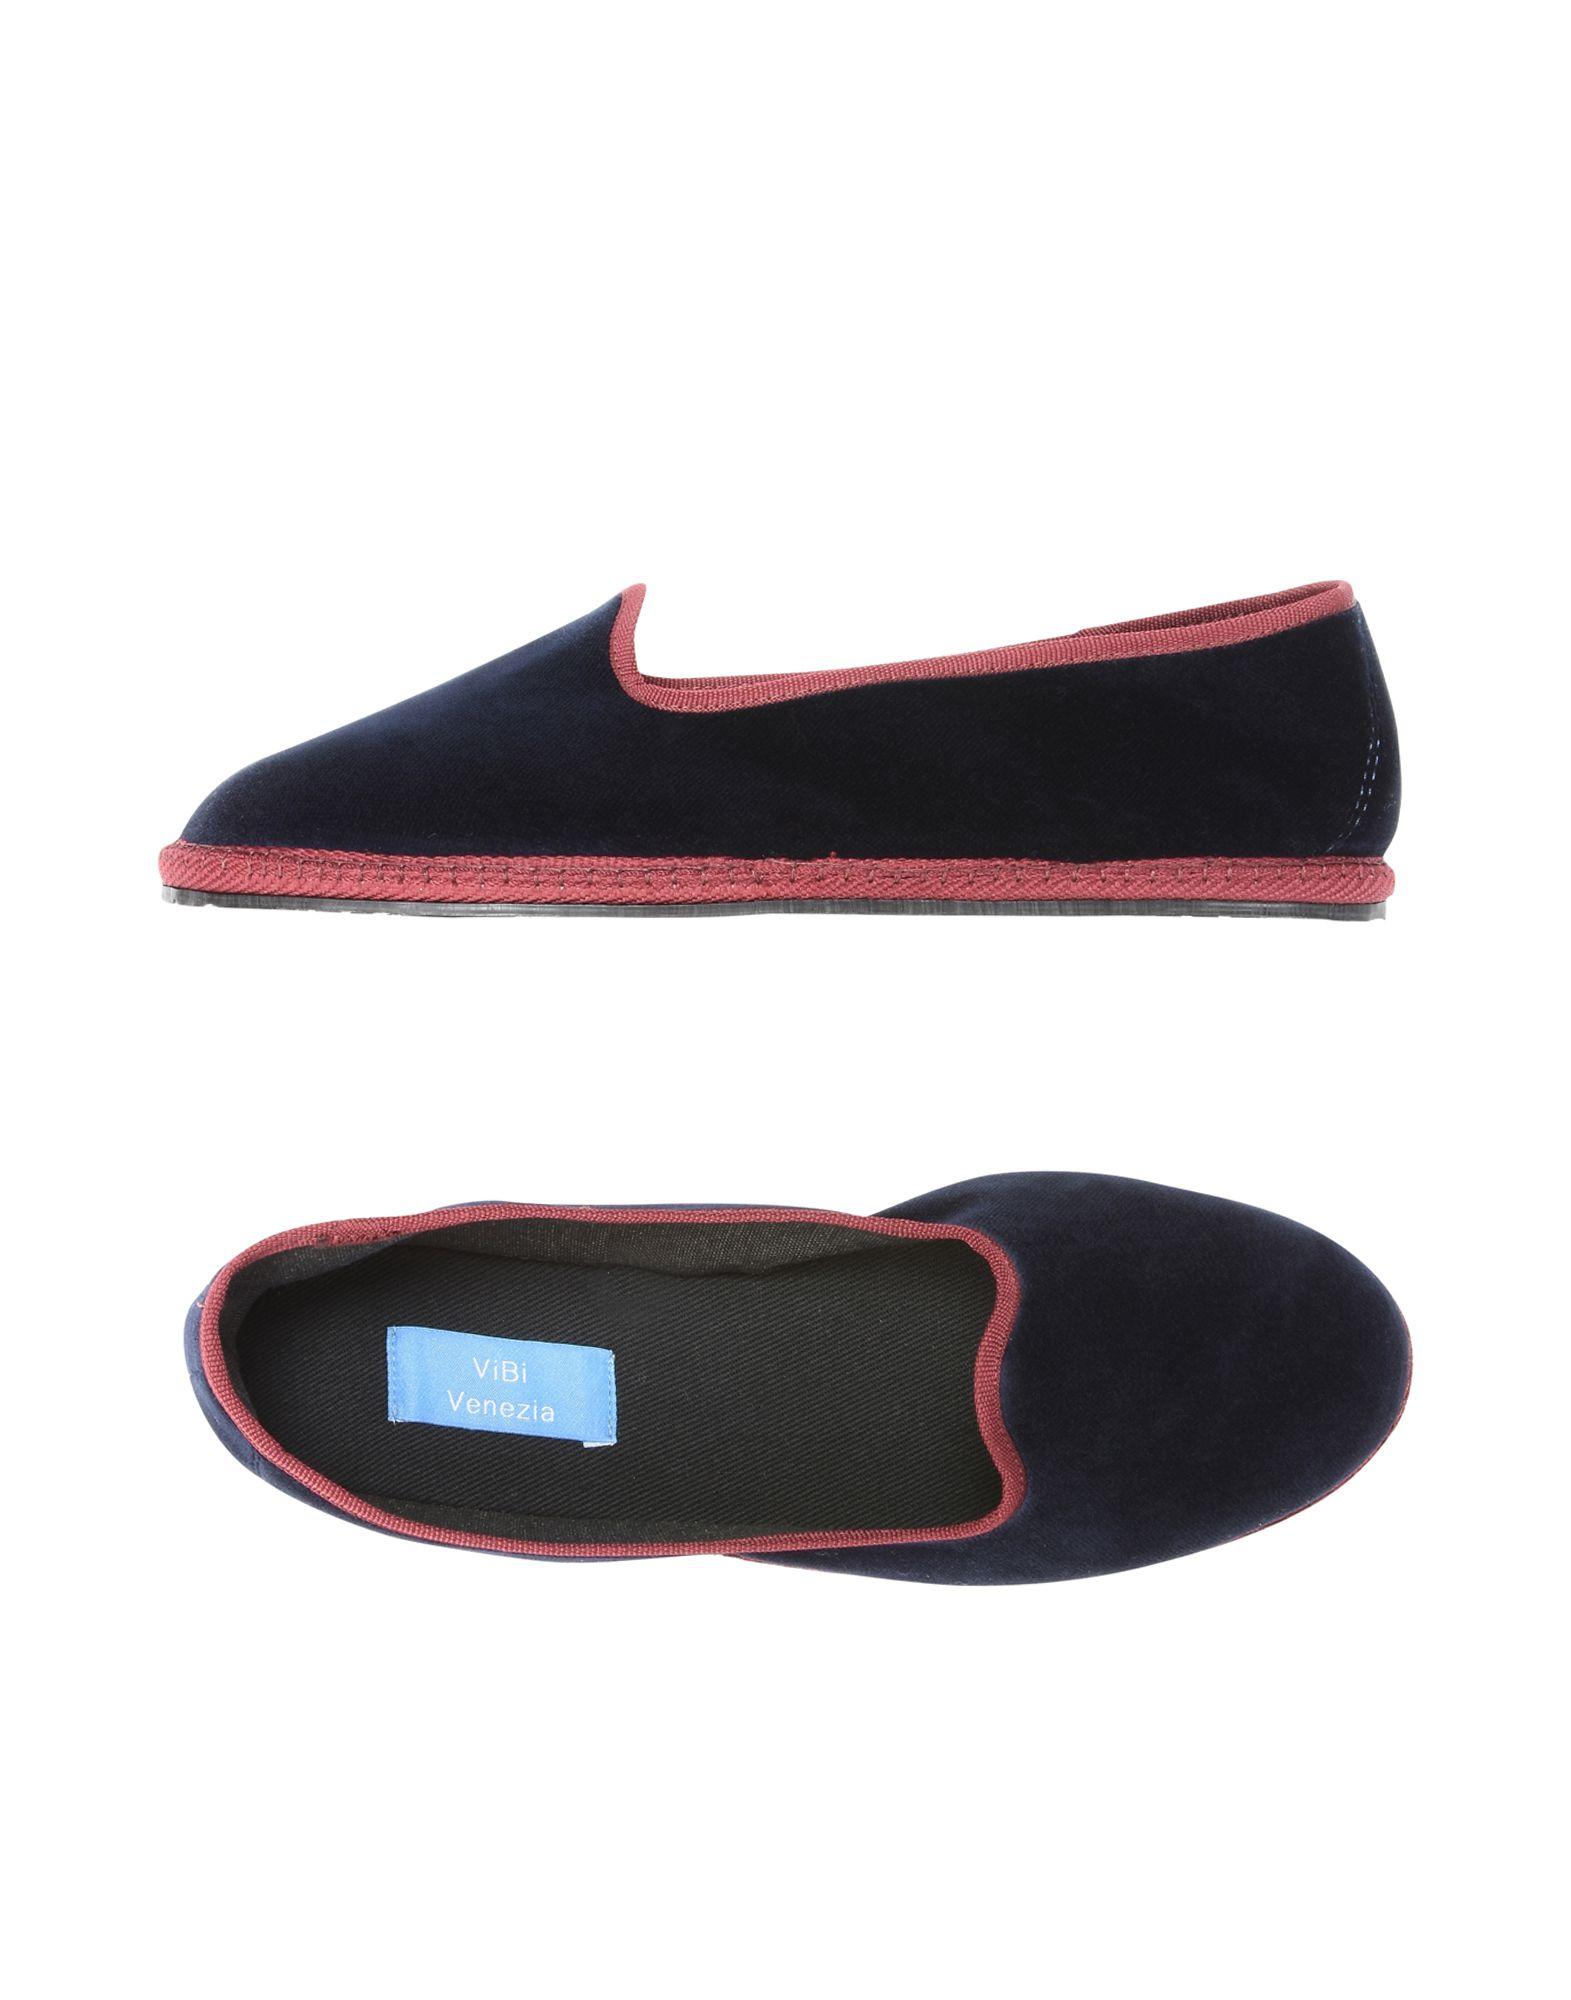 Vibi  Venezia X Yoox Mokassins Damen  11379784BW Gute Qualität beliebte Schuhe